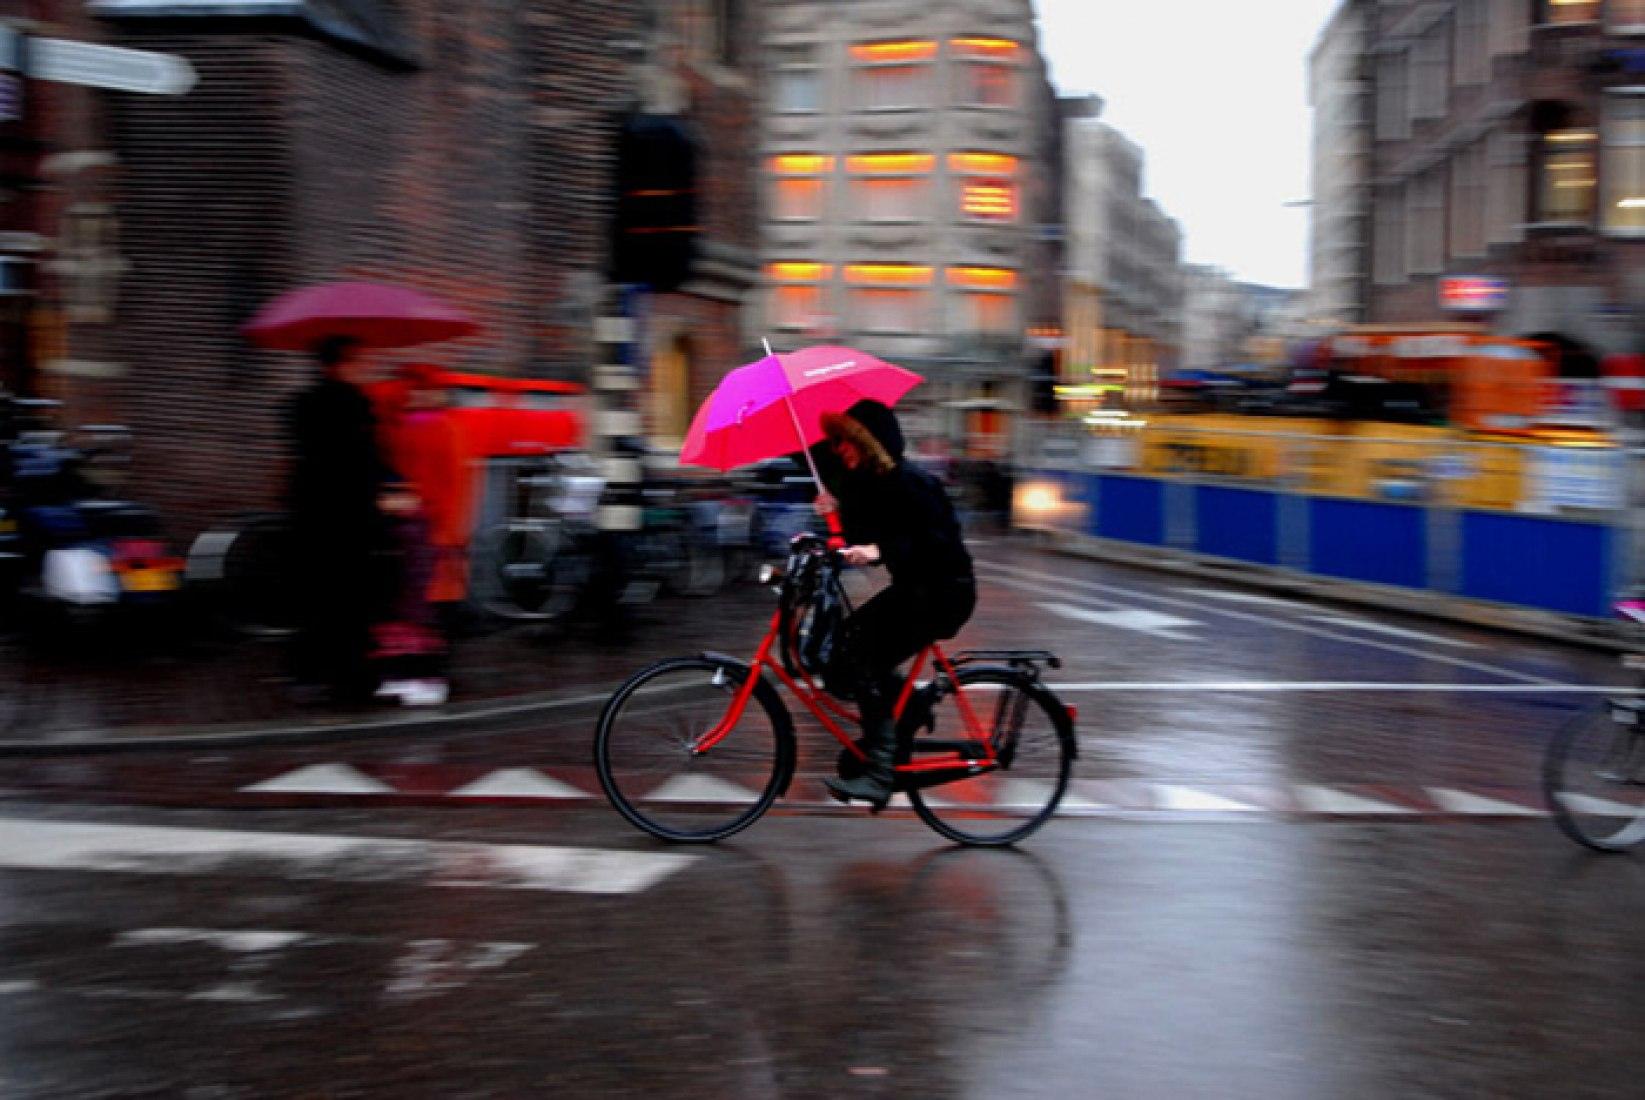 Under the rain. Photography © Francisco Peláez Marín